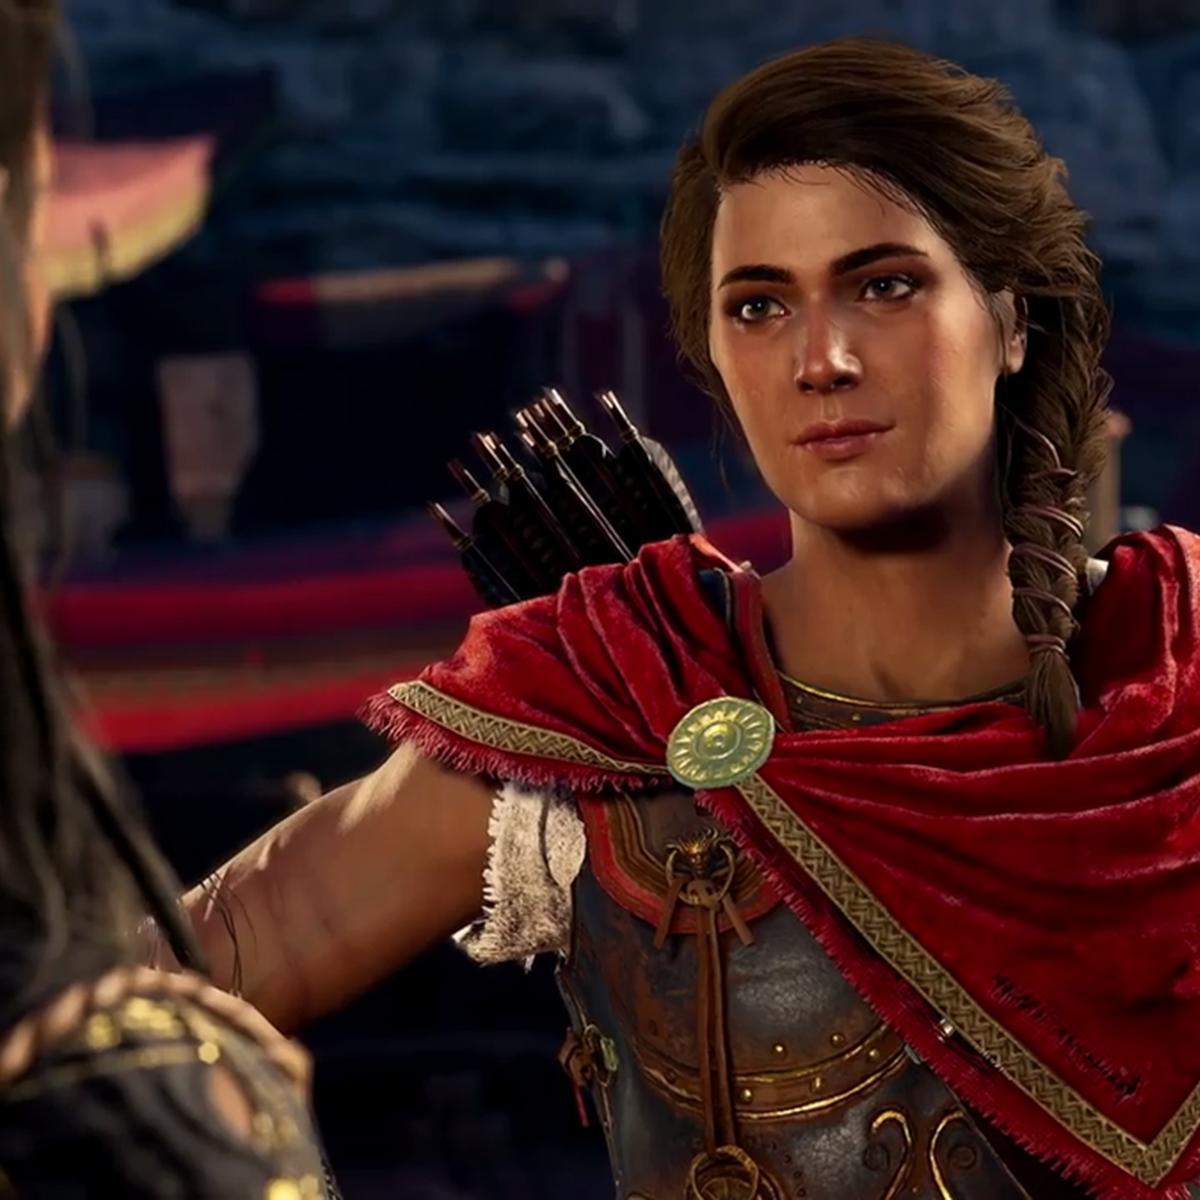 Assassin's Creed Odyssey - Kassandra